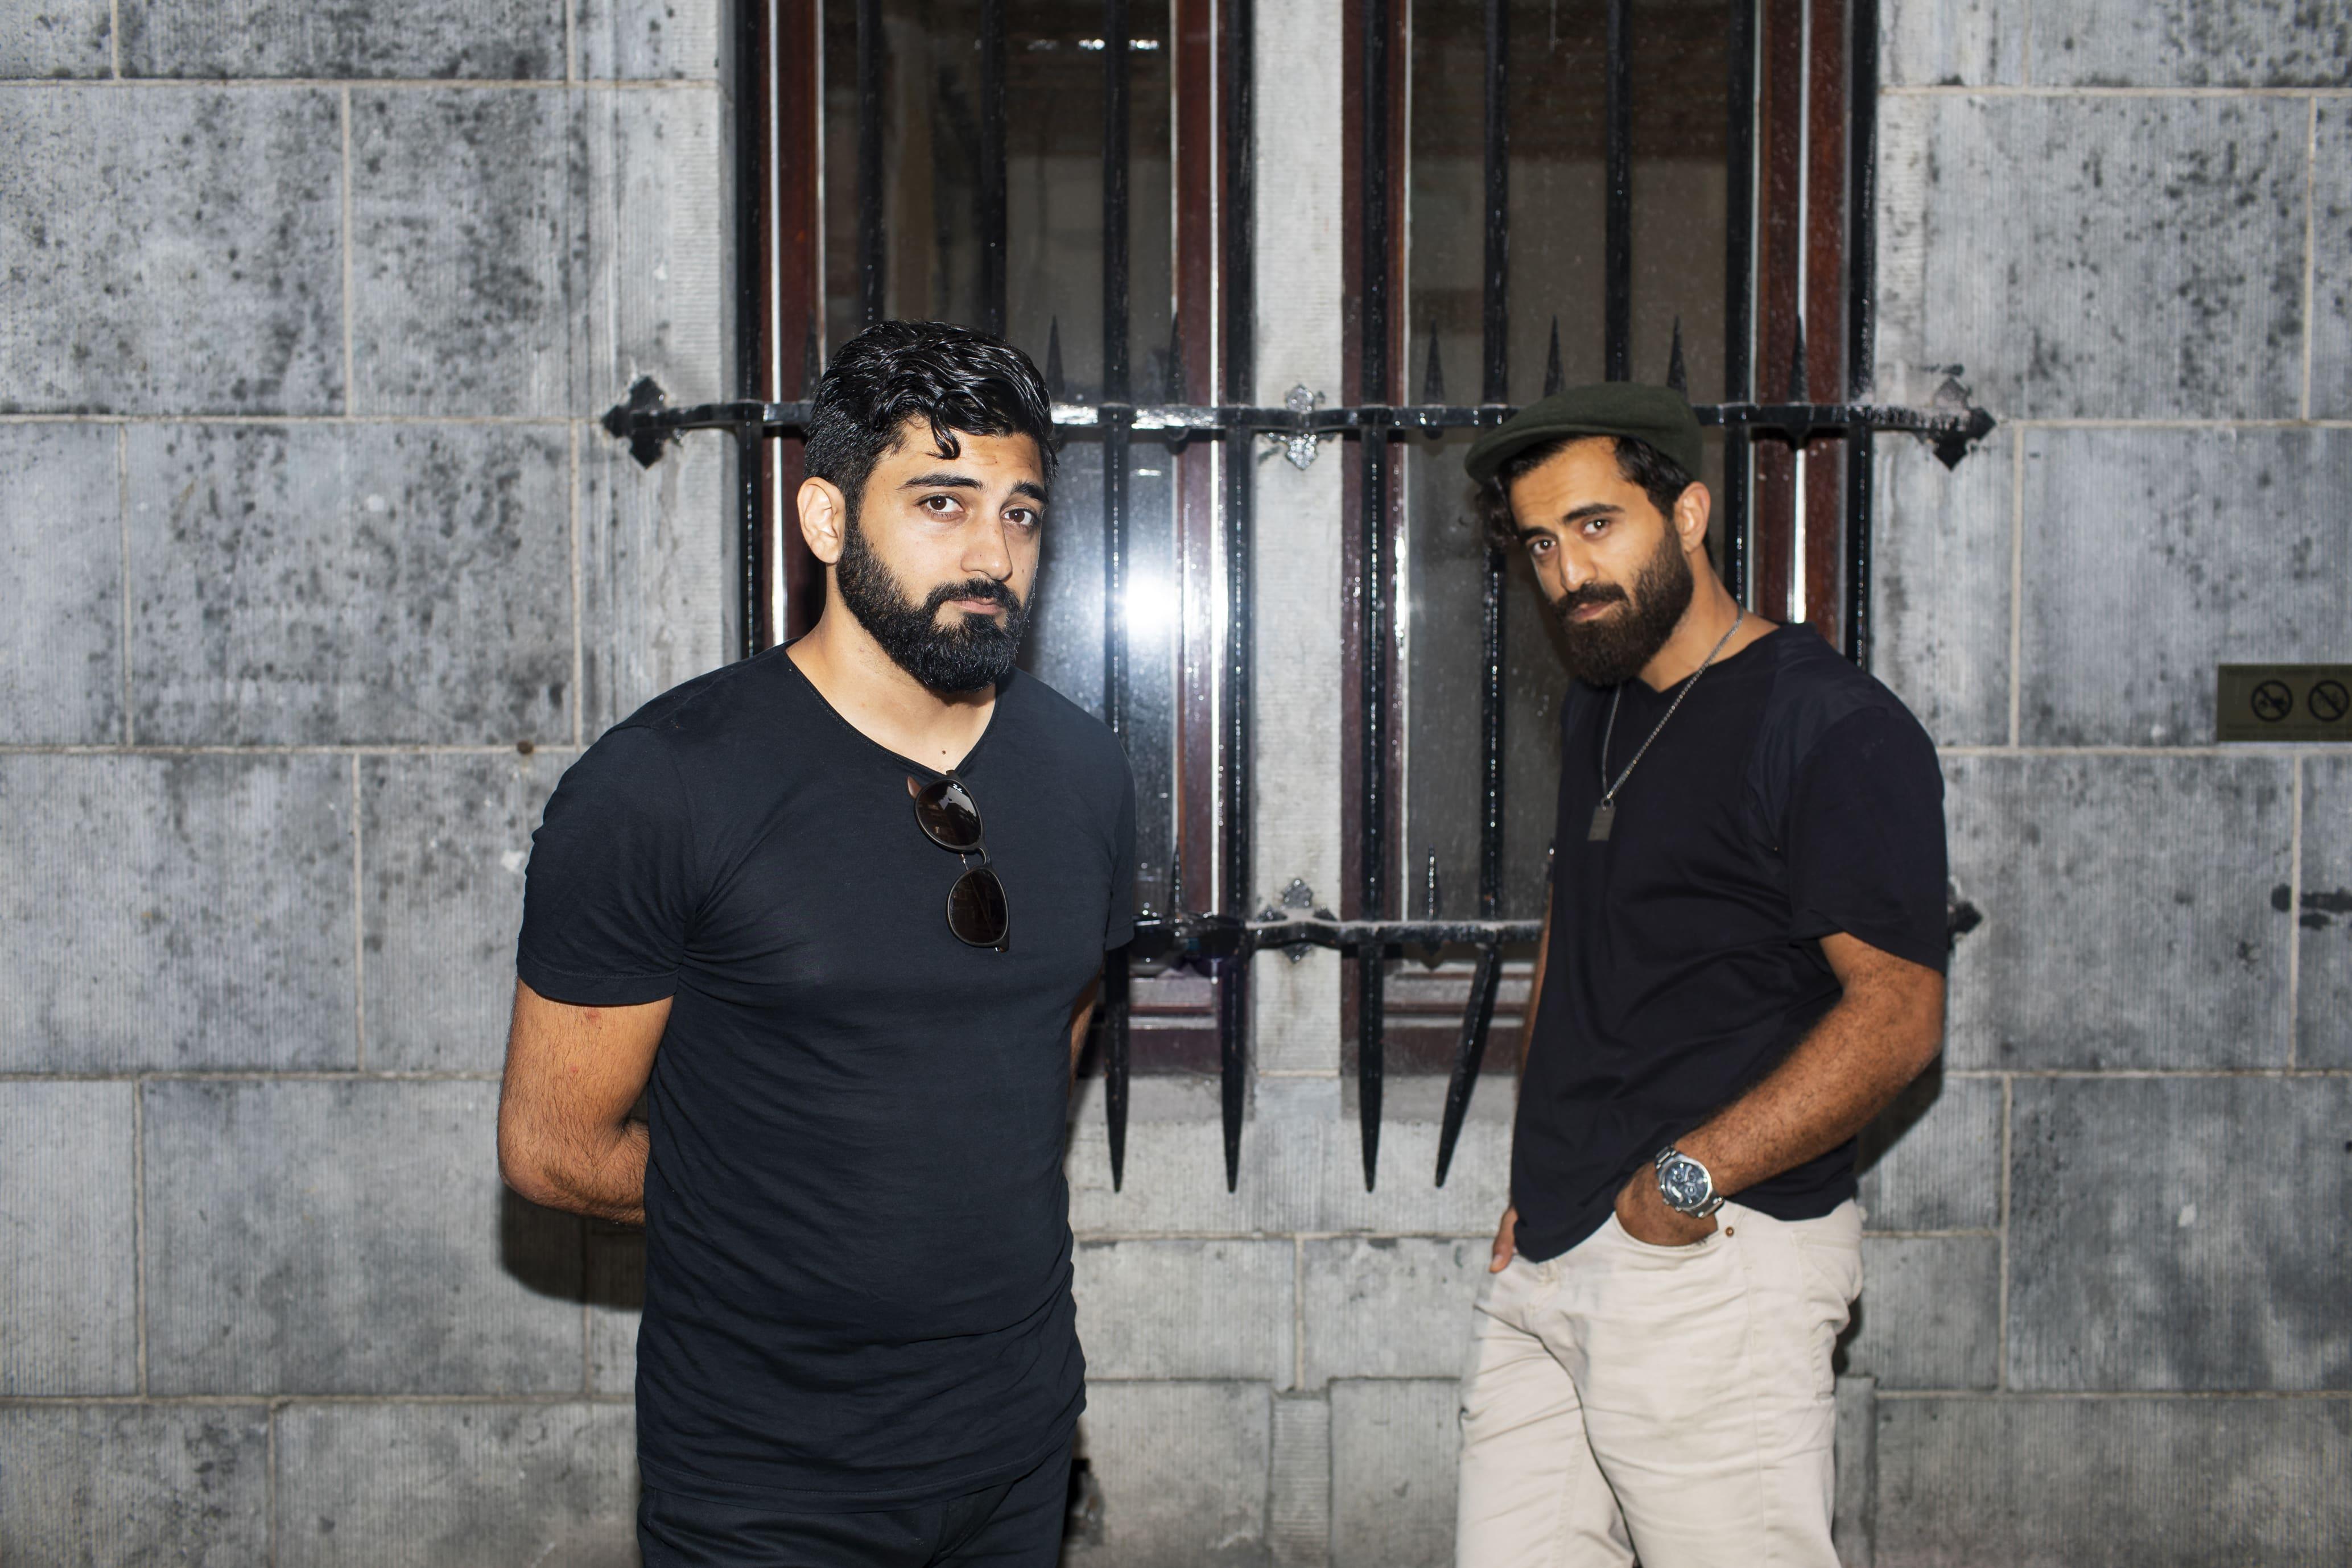 Nima Mohaghegh & Saman Amini